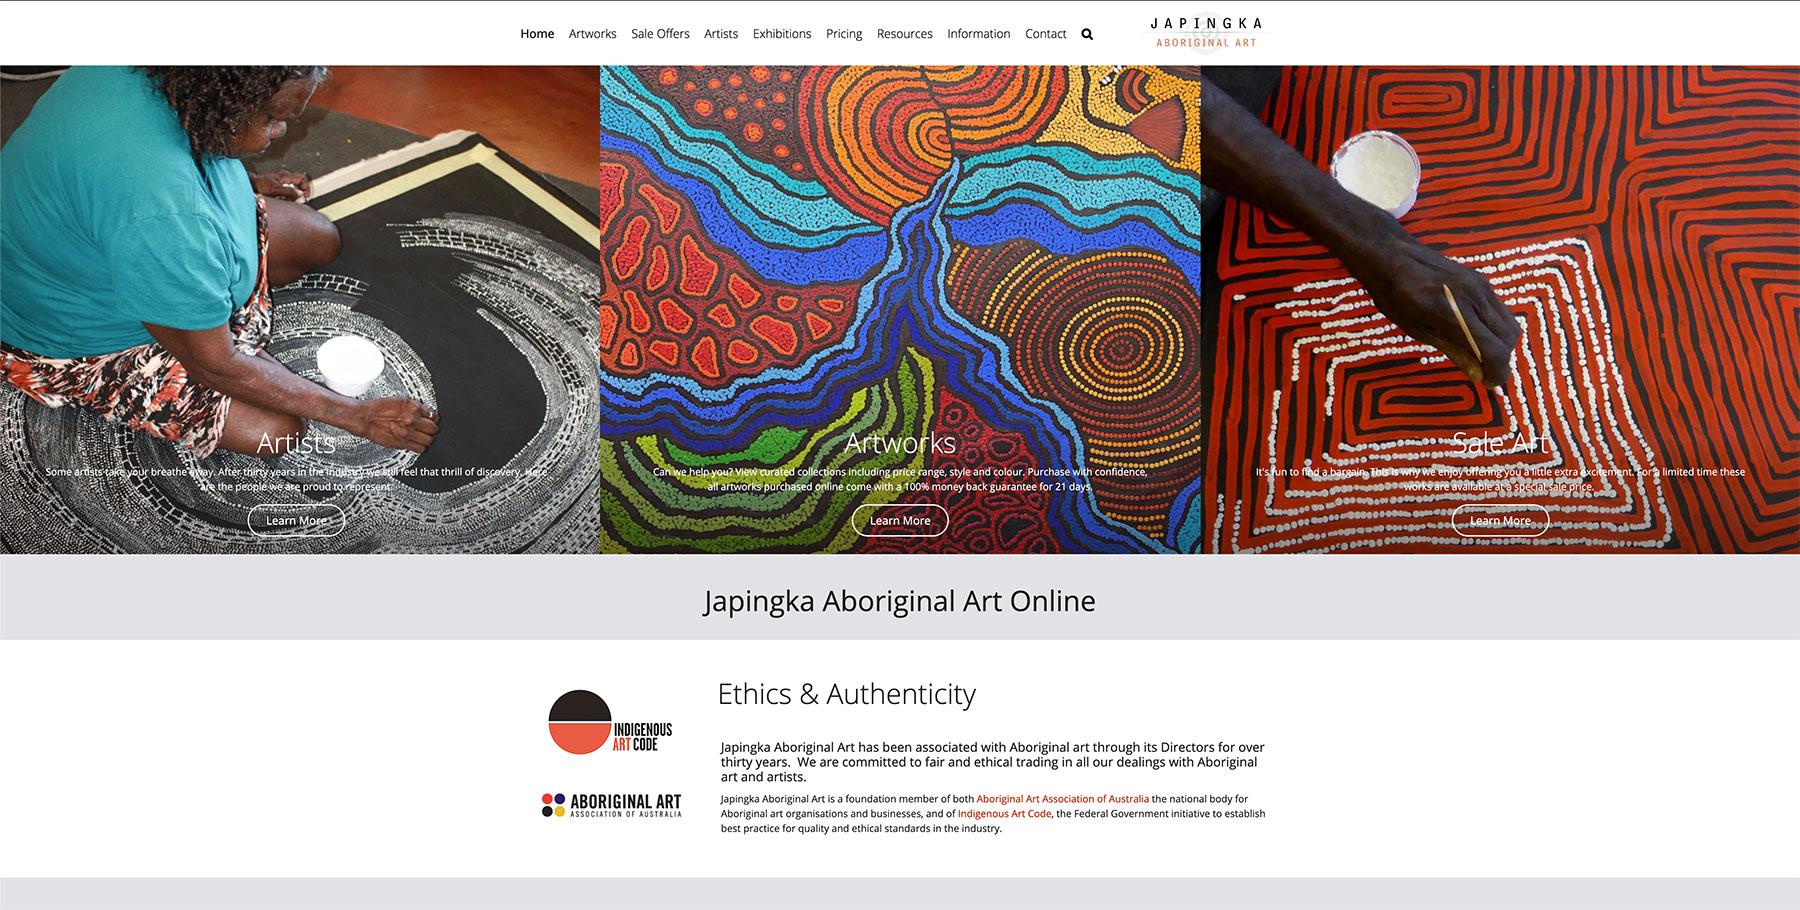 Japingka Aboriginal Art Gallery Website